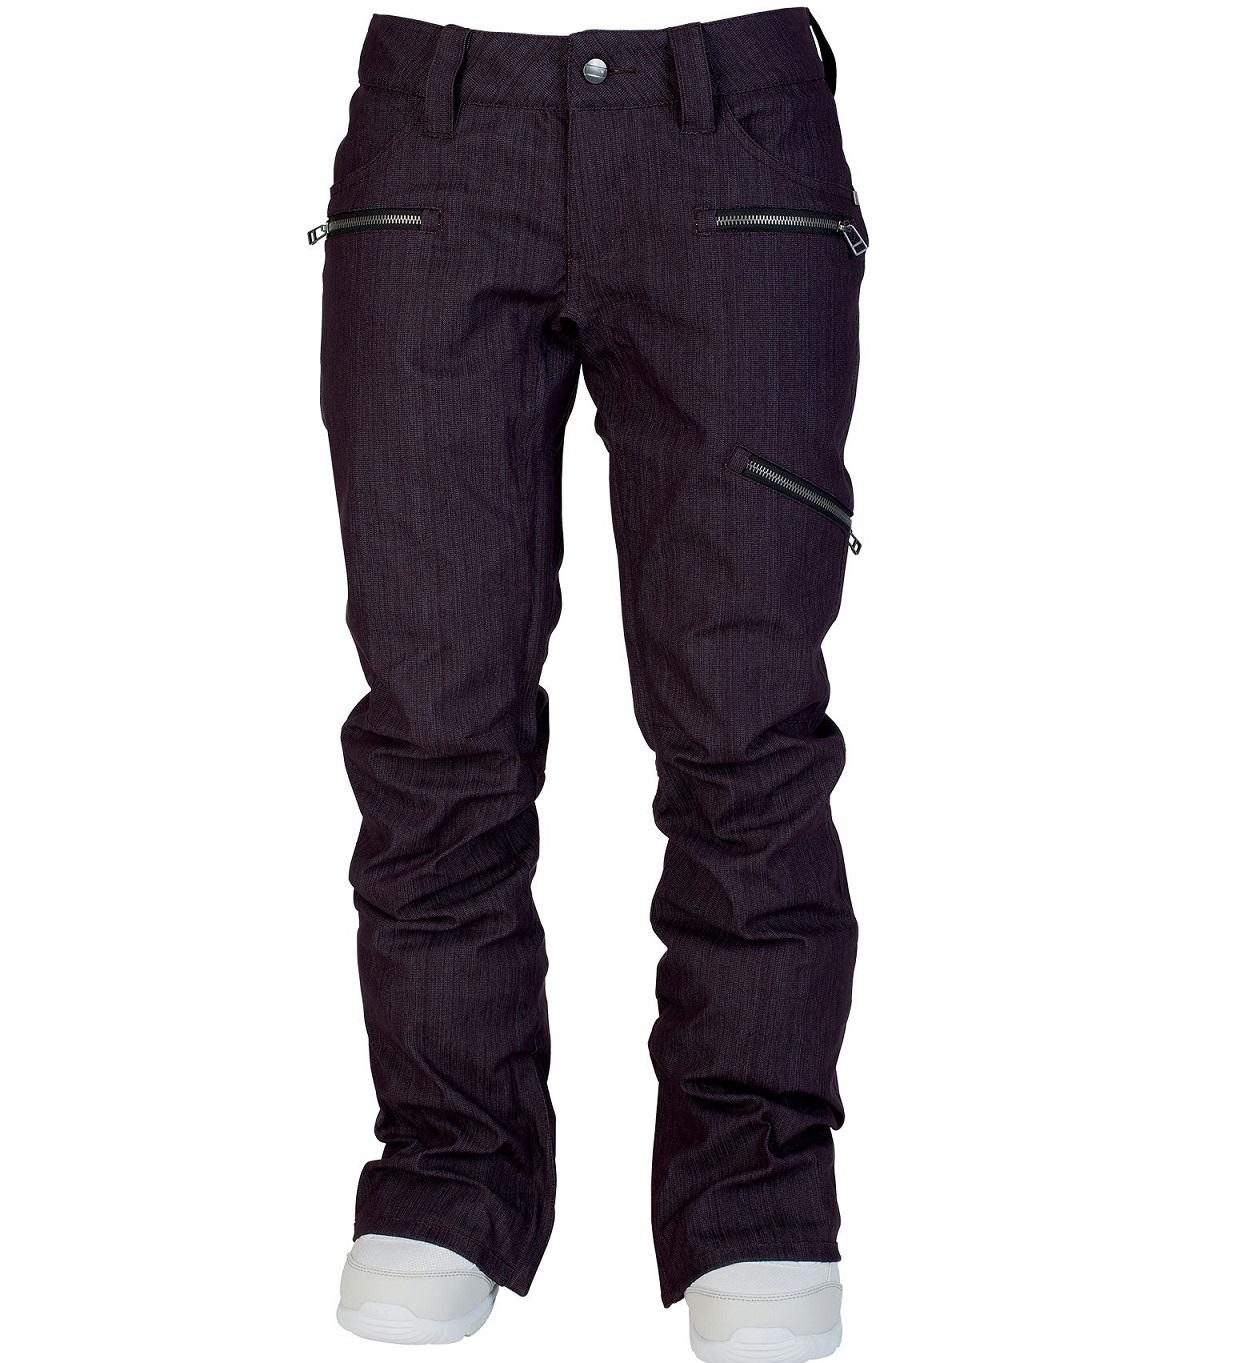 Nitro L1 dámské kalhoty na snowboard Scarlet Opium Overdye Denim Velikost: S Doprava zdarma